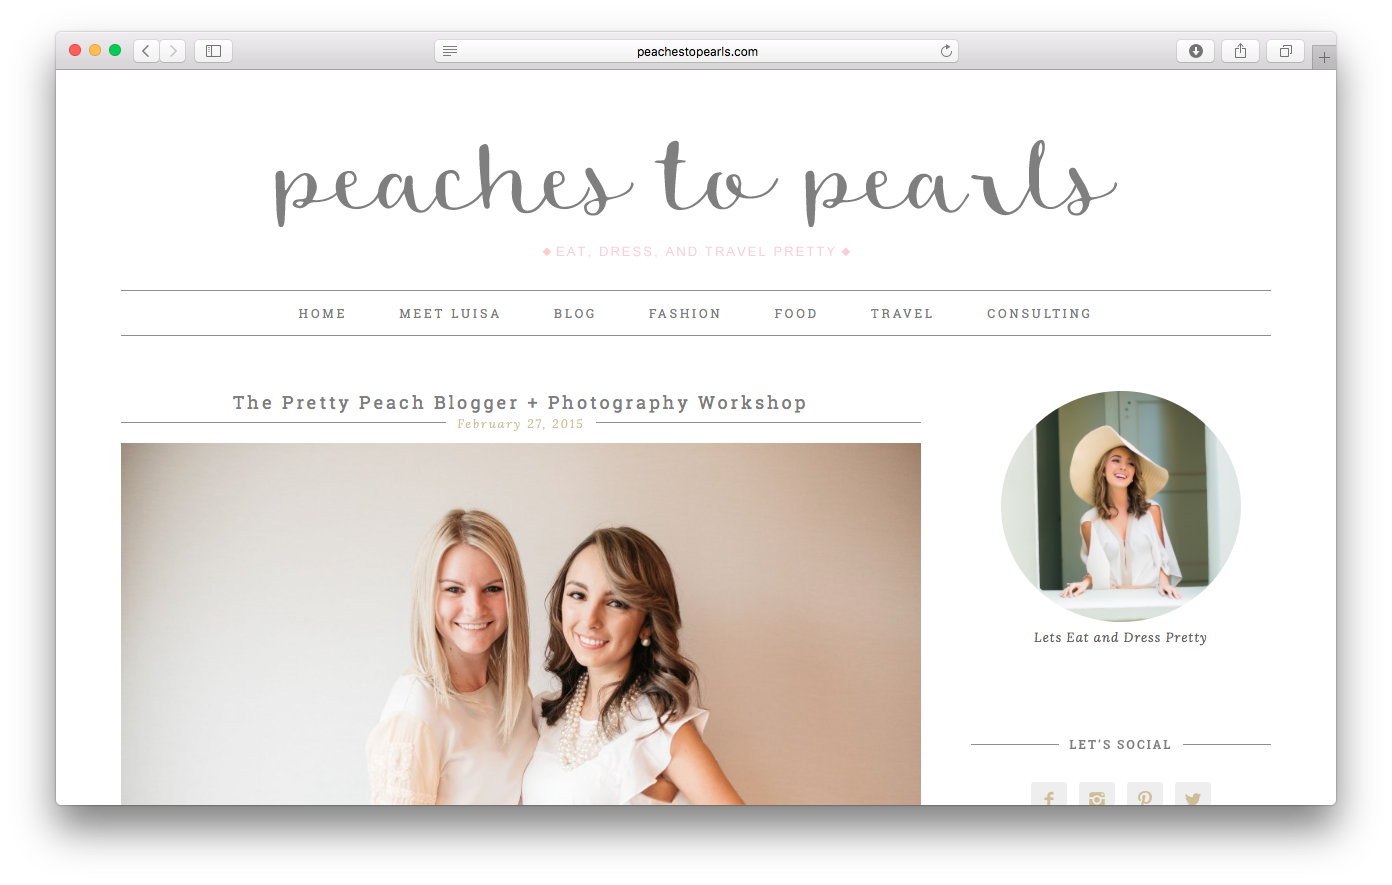 http://peachestopearls.com/the-pretty-peach-blogger-photography-workshop/